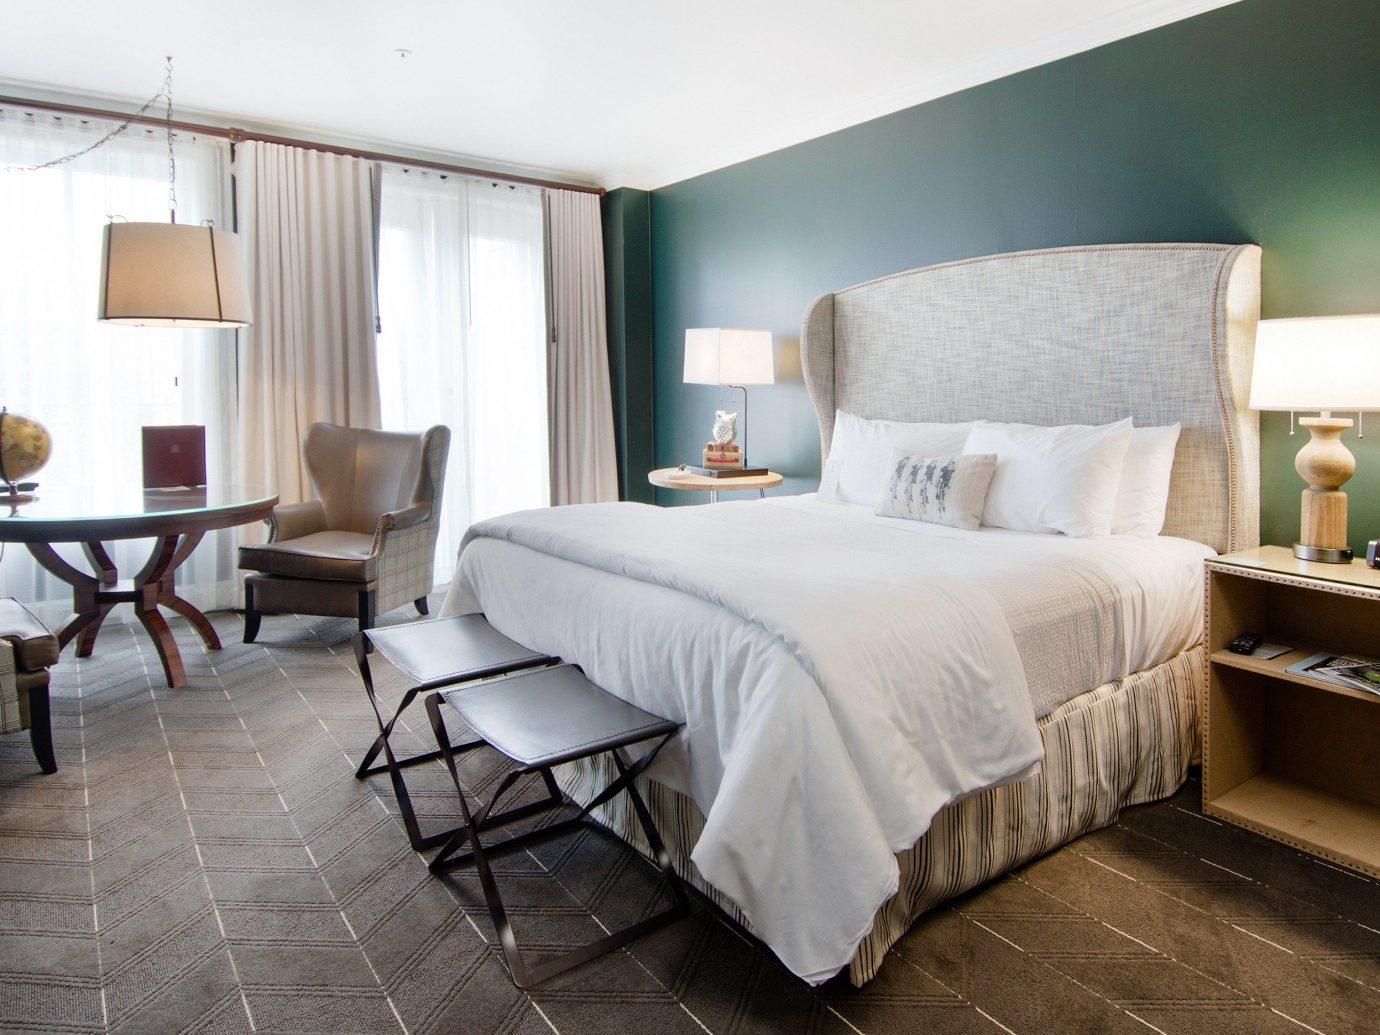 Sentinal Hotel in Oregon